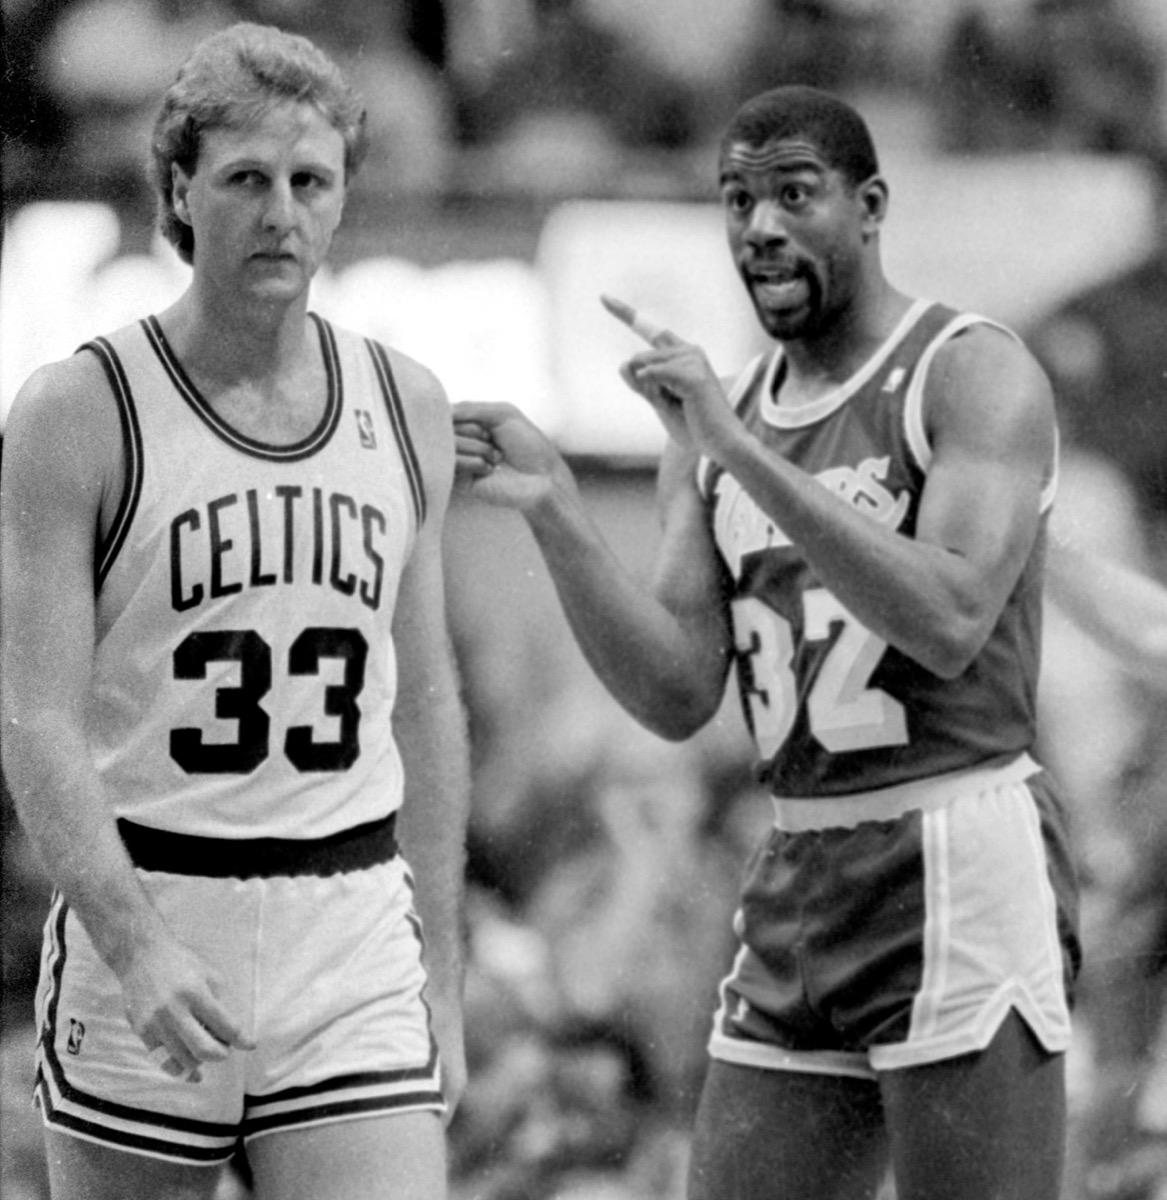 larry bird and michael johnson feud, 1980s nostalgia